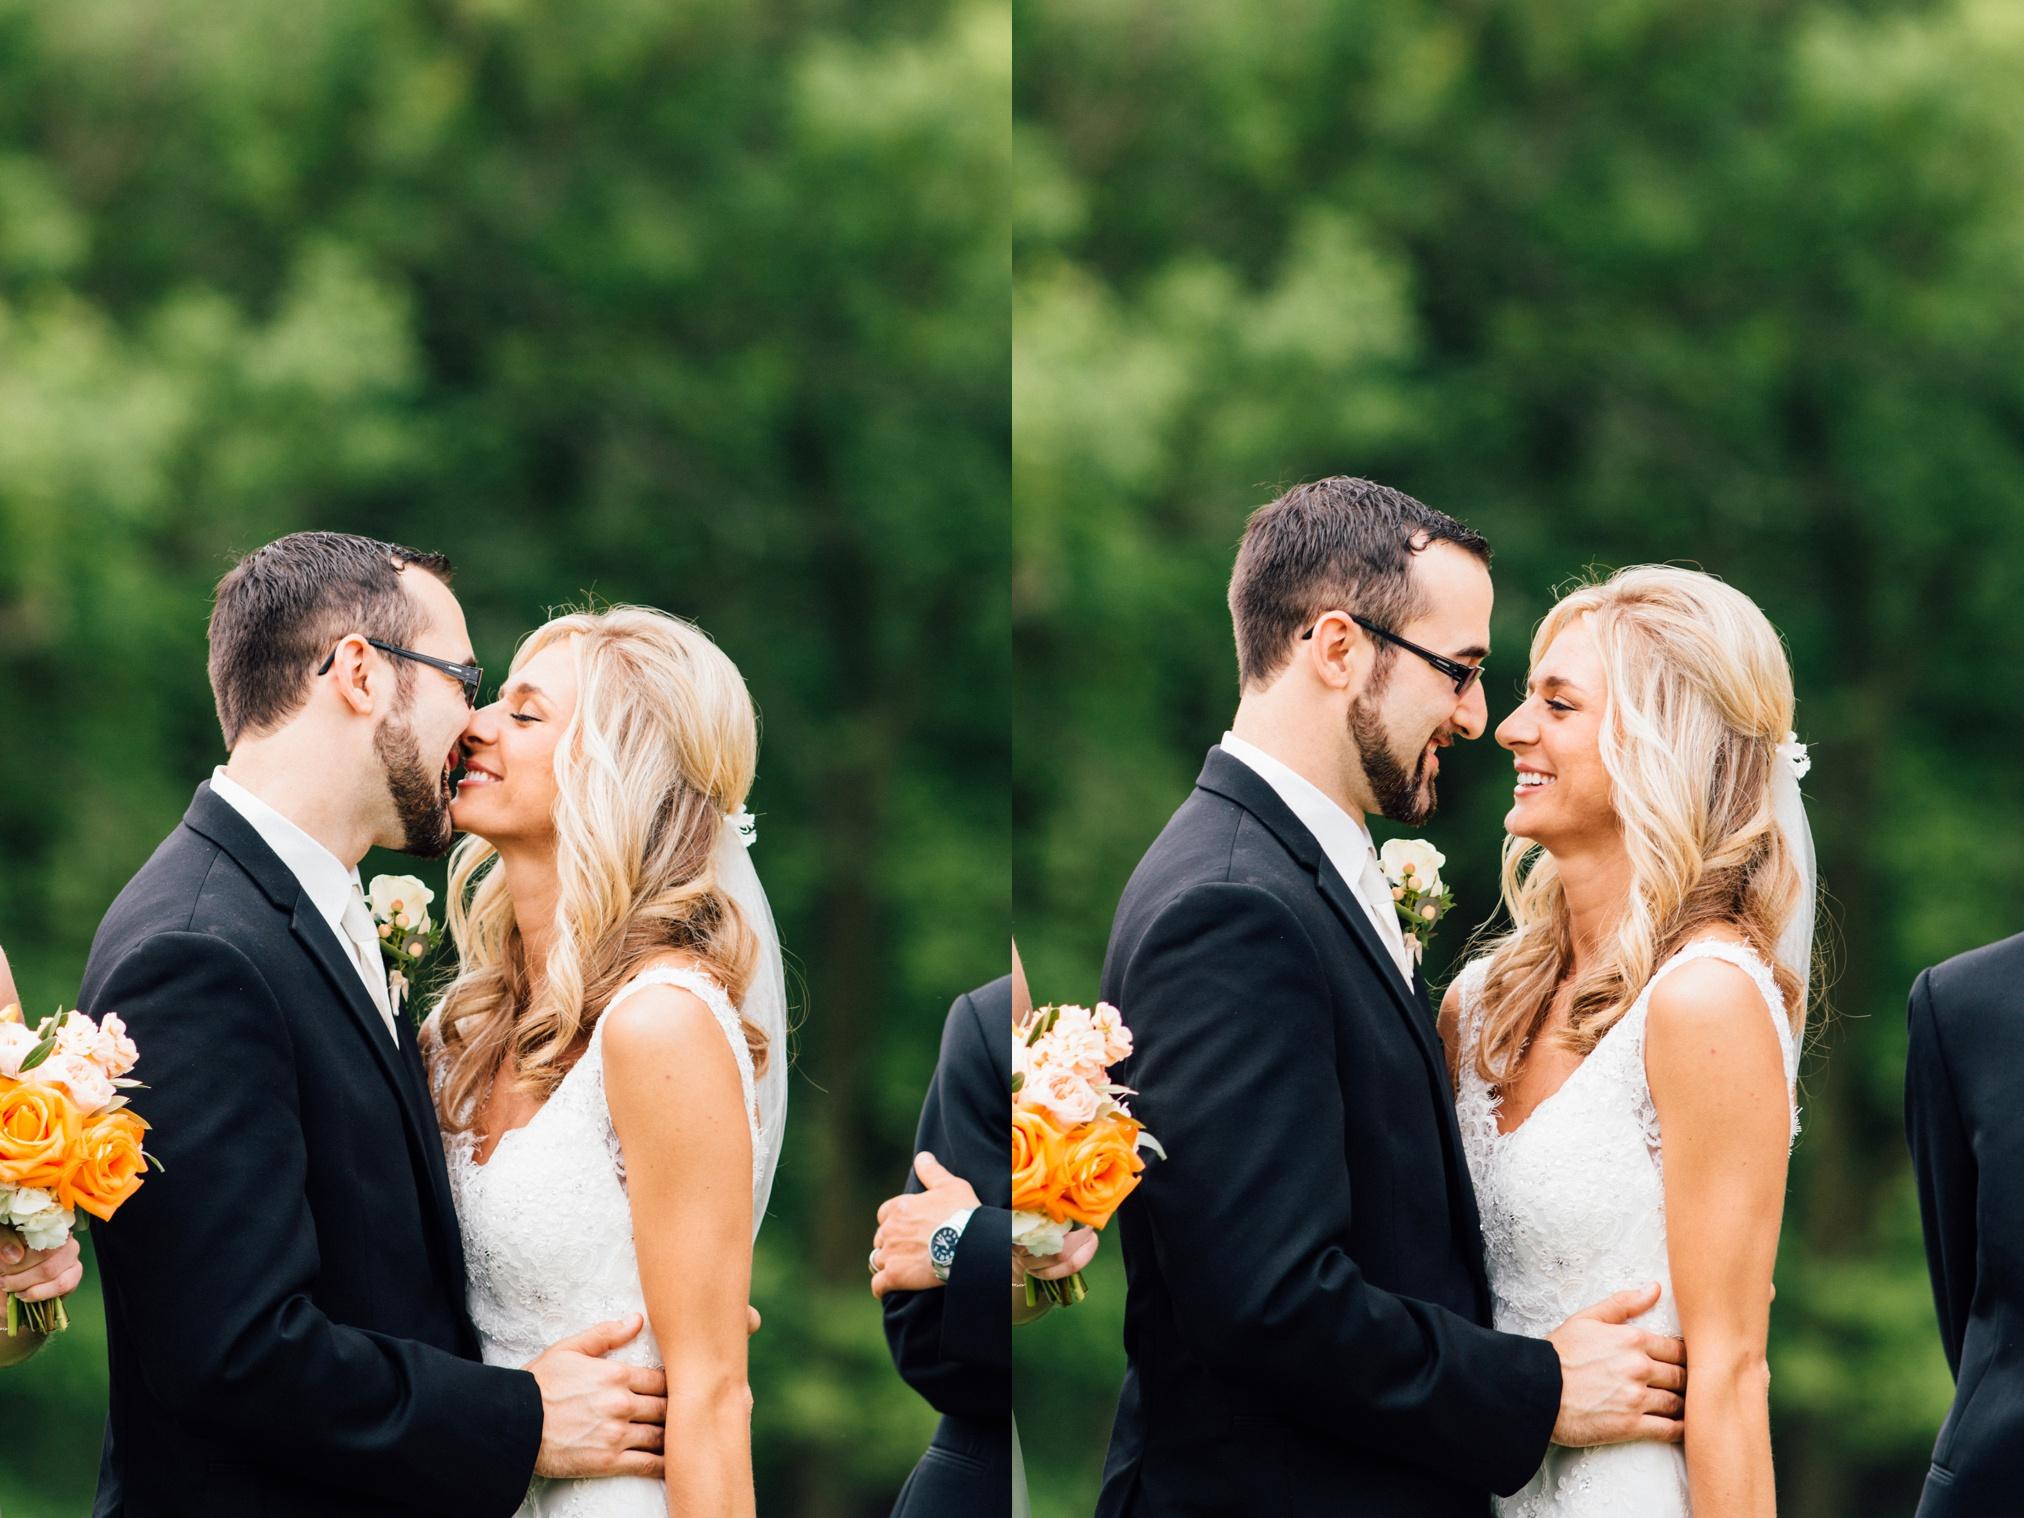 schmid_wedding-627.jpg